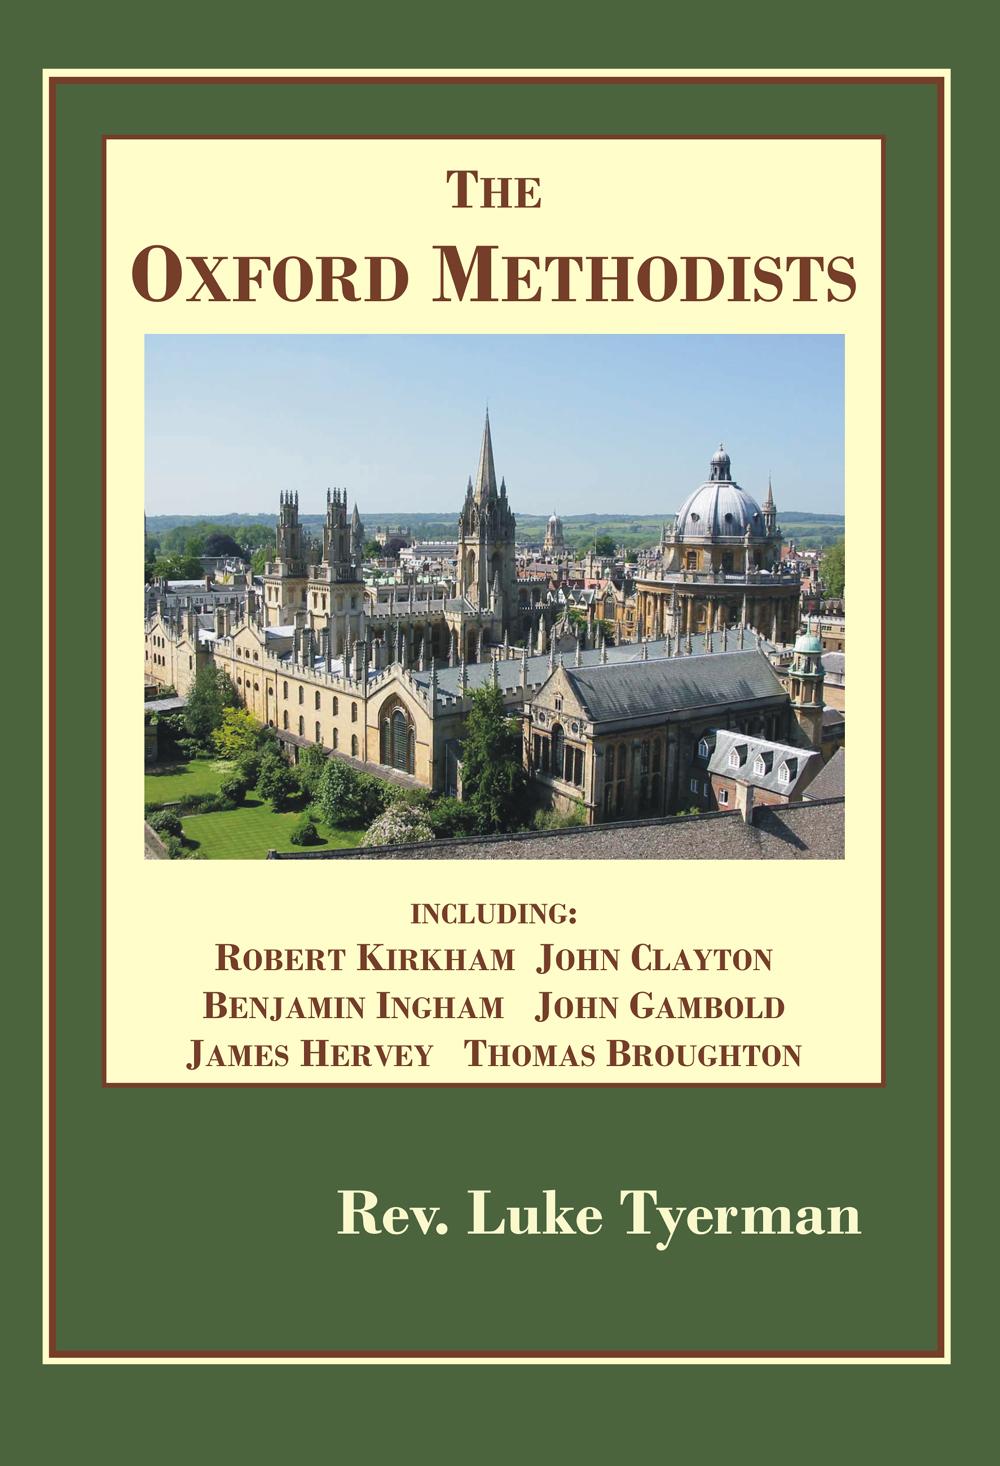 Oxford Methodists